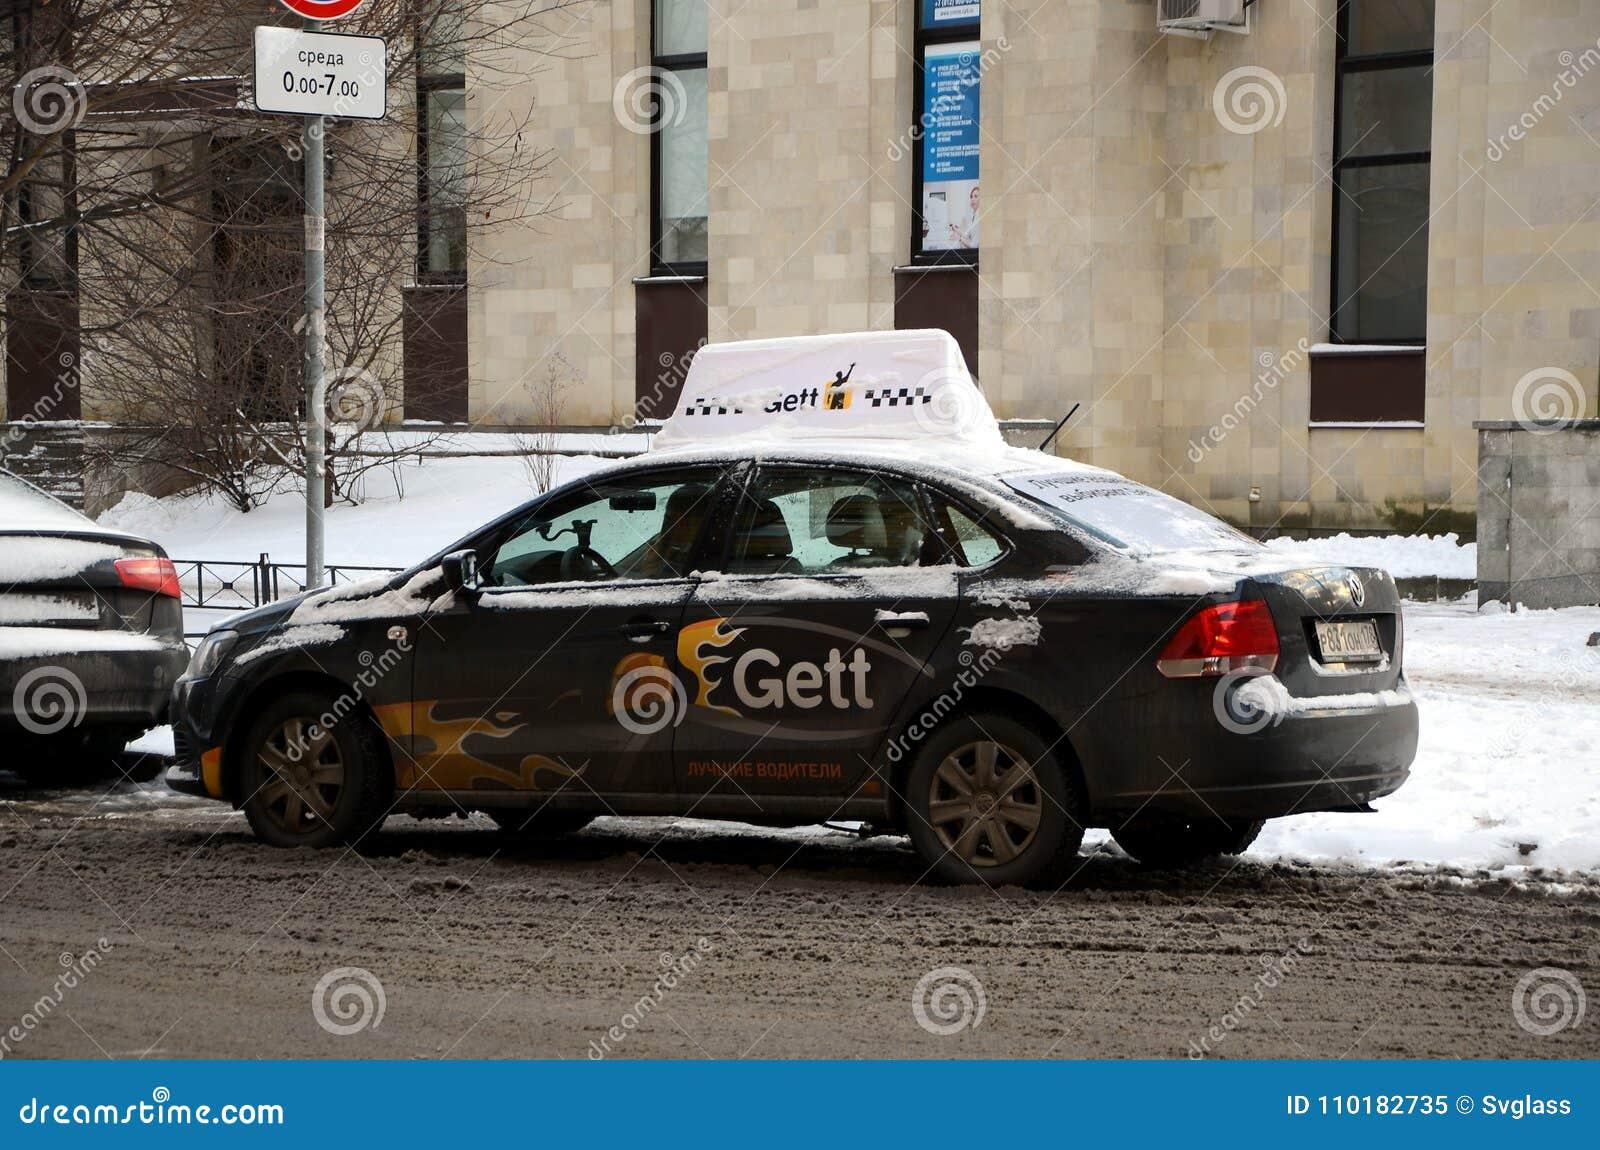 Gett car editorial image  Image of identification